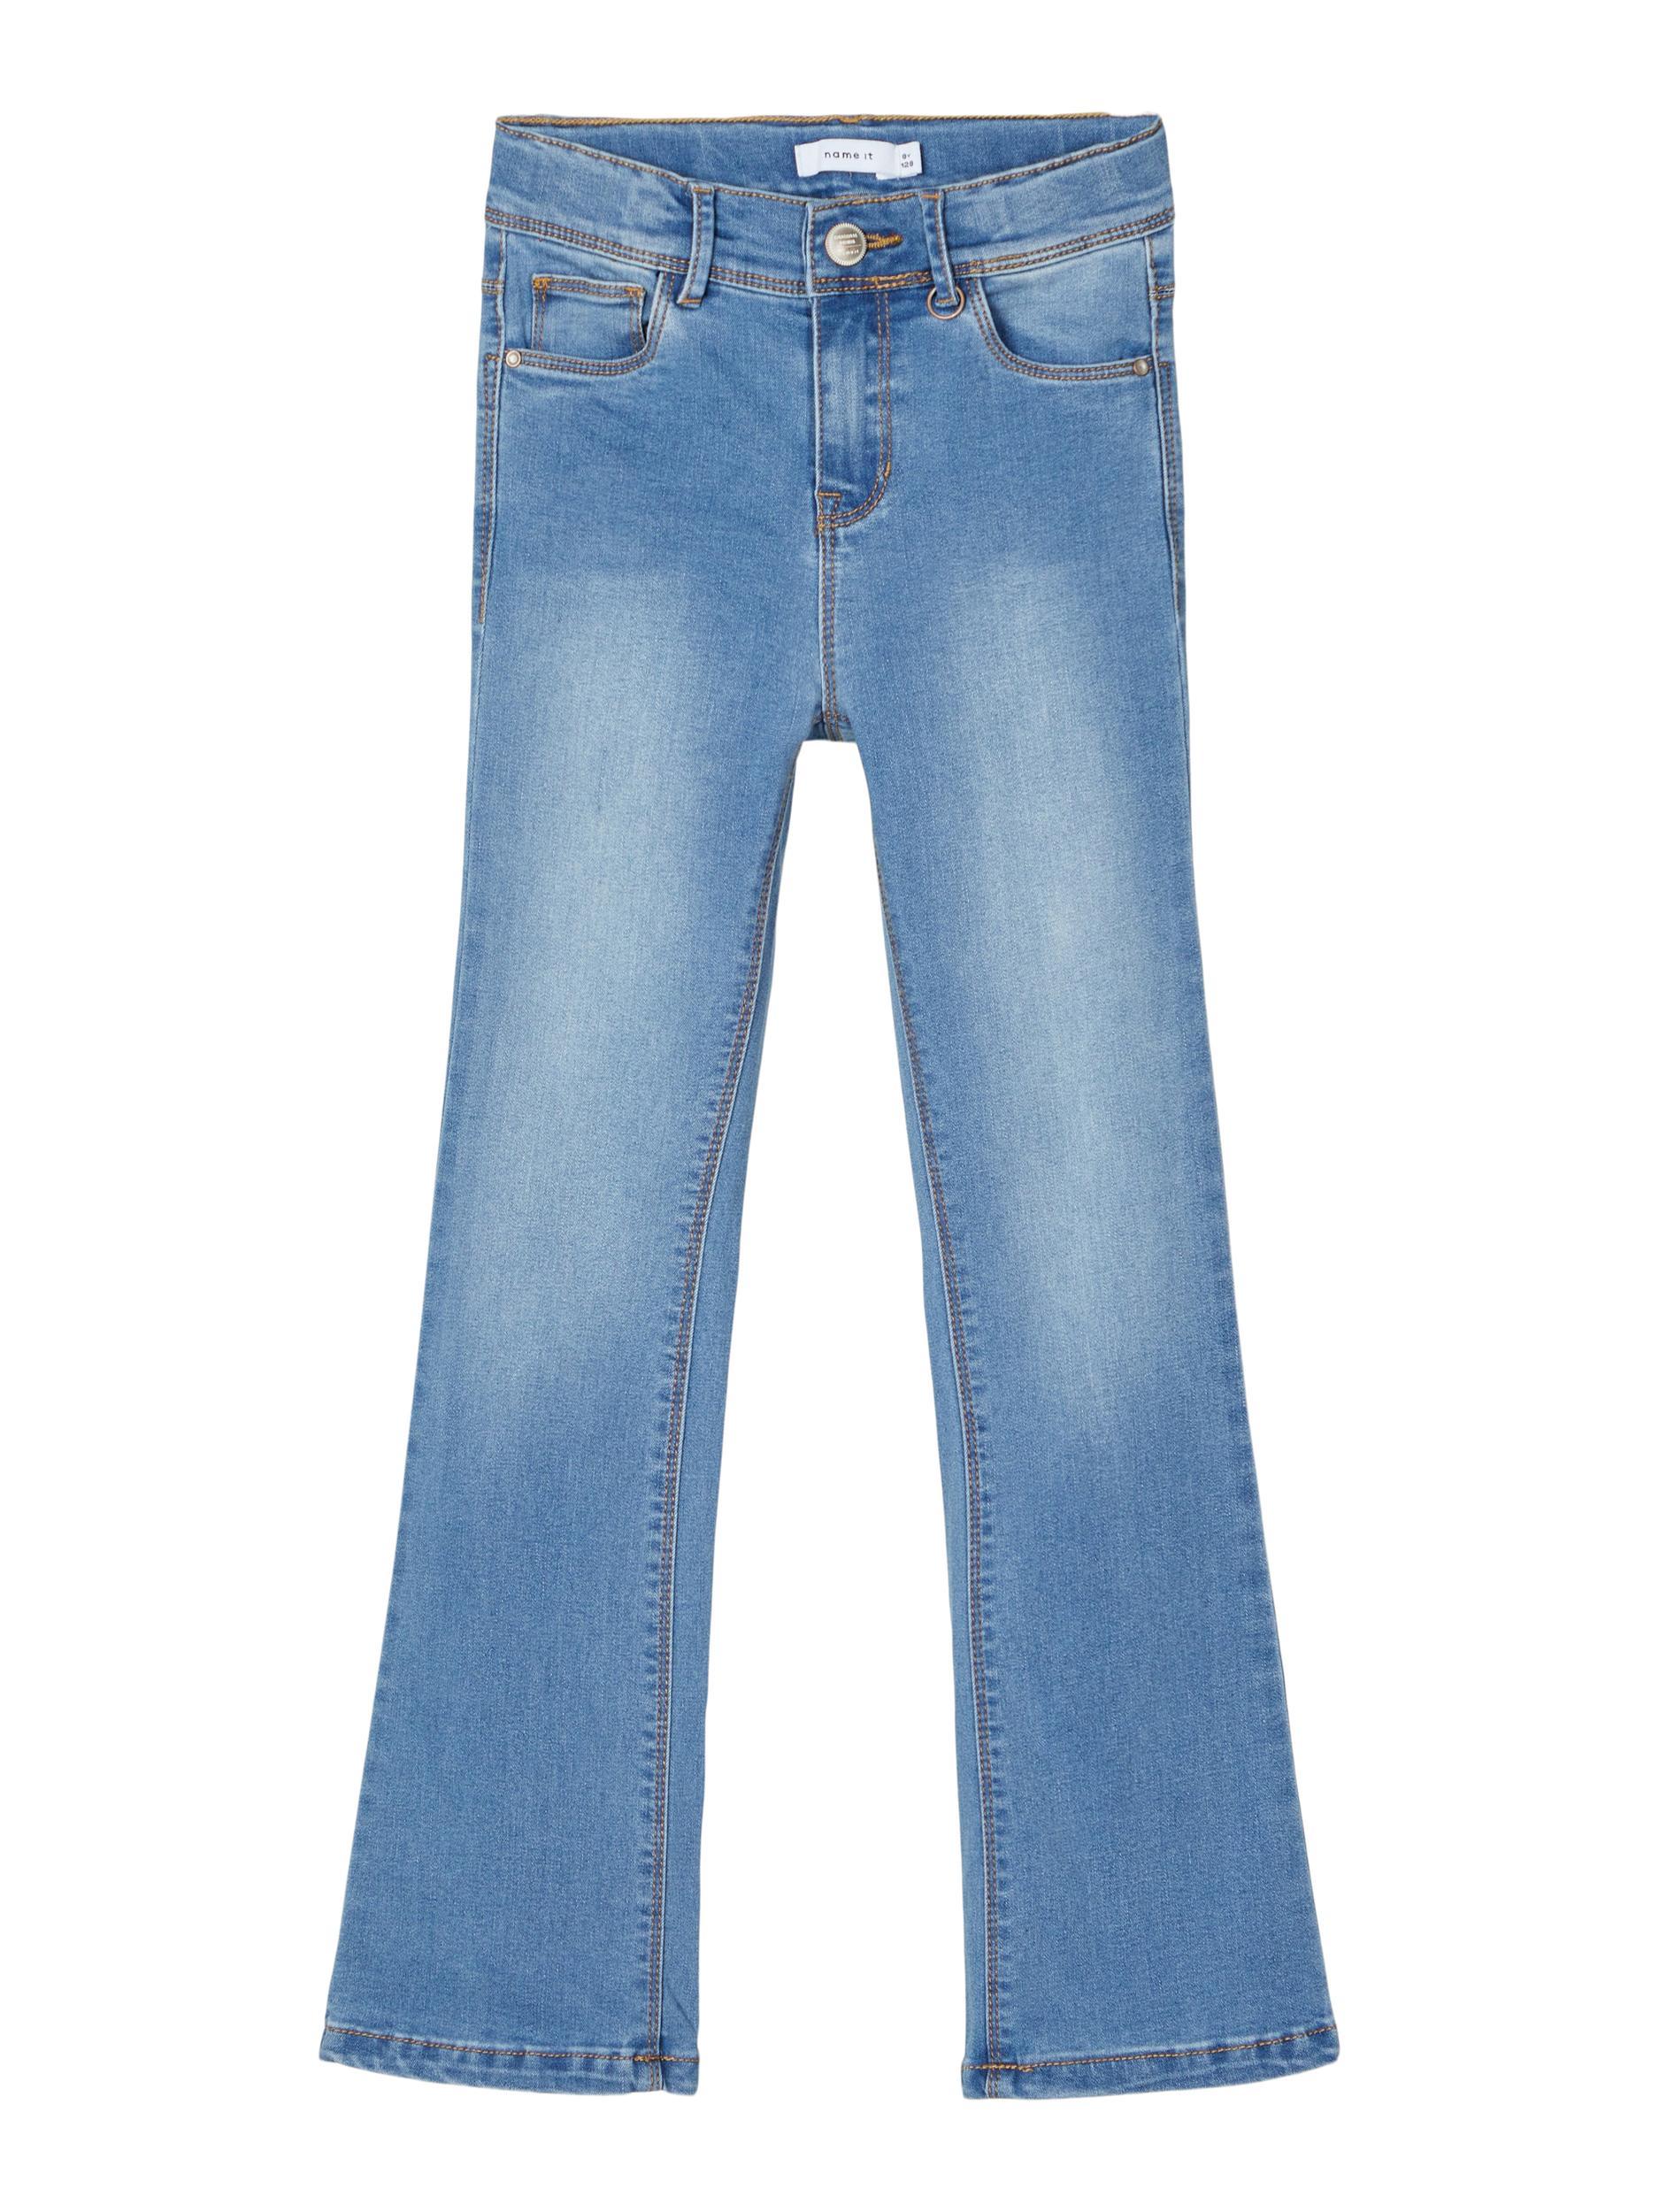 Name It Polly Trillas jeans, medium blue denim, 134